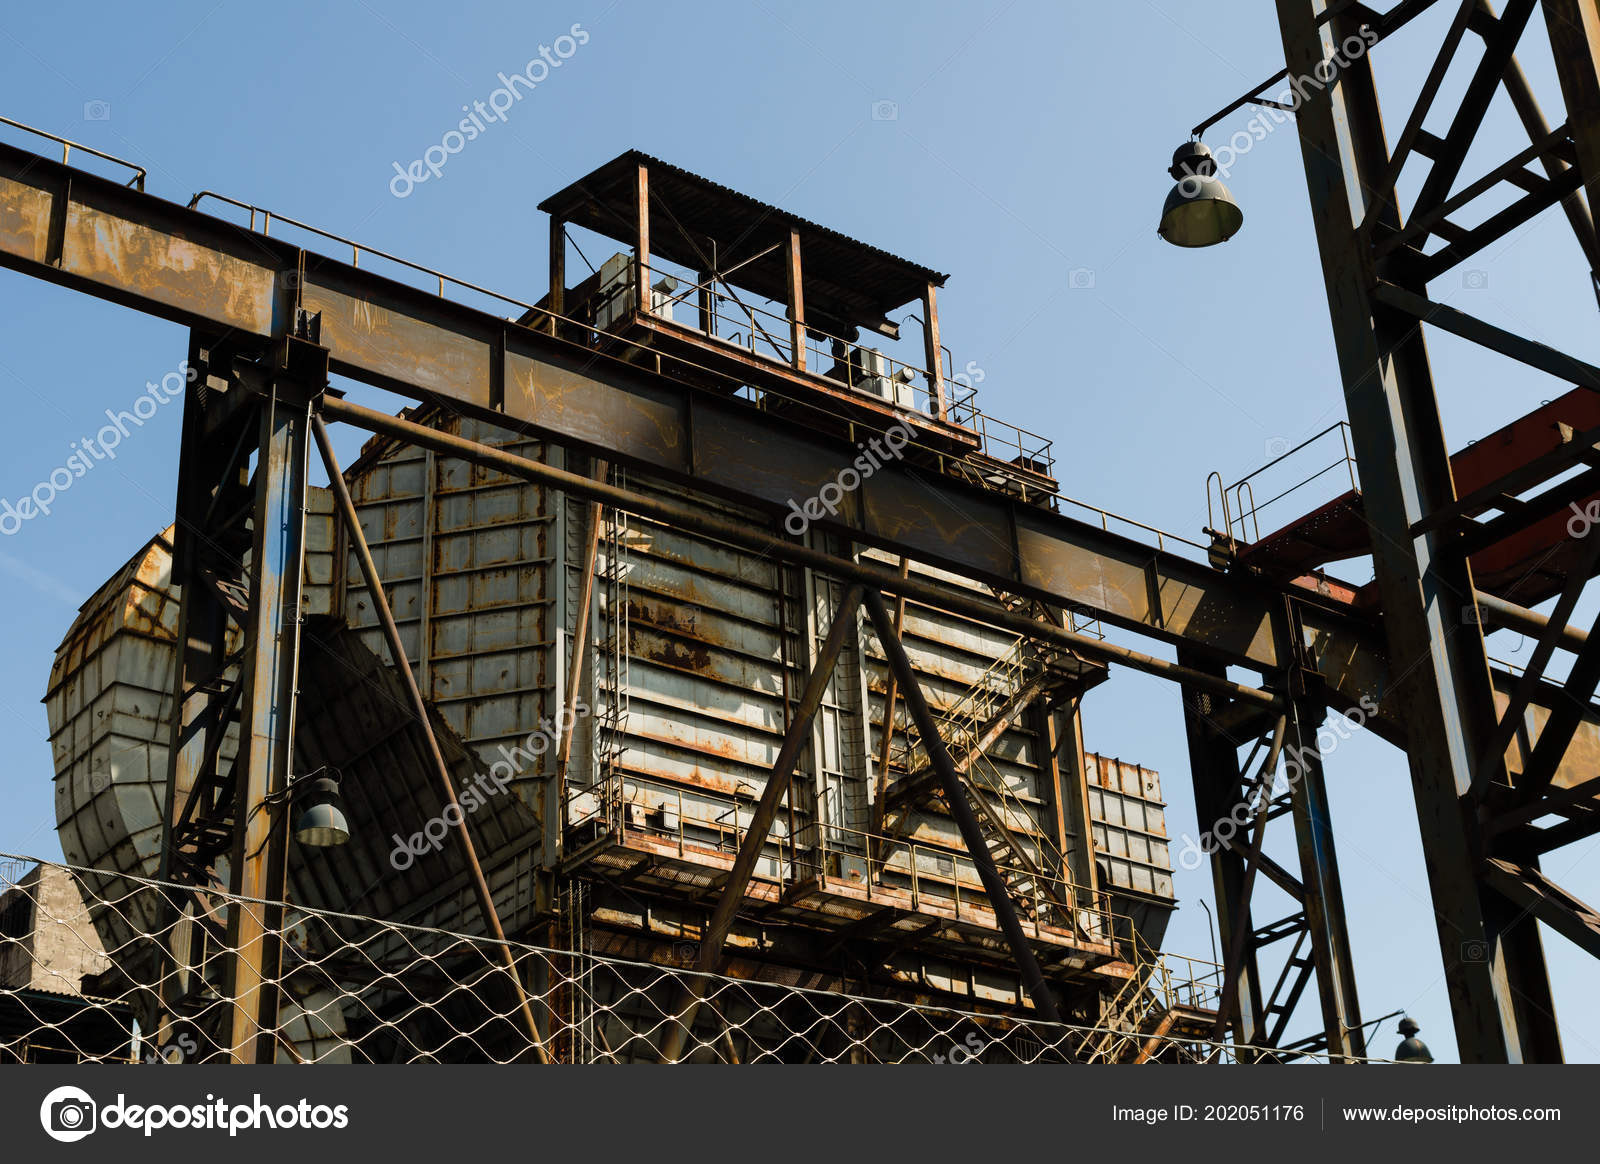 Abandoned Buildings Dolni Vitkovice Industrial Area Ostrava Czech Republic Stock Photo C Vidumg 202051176